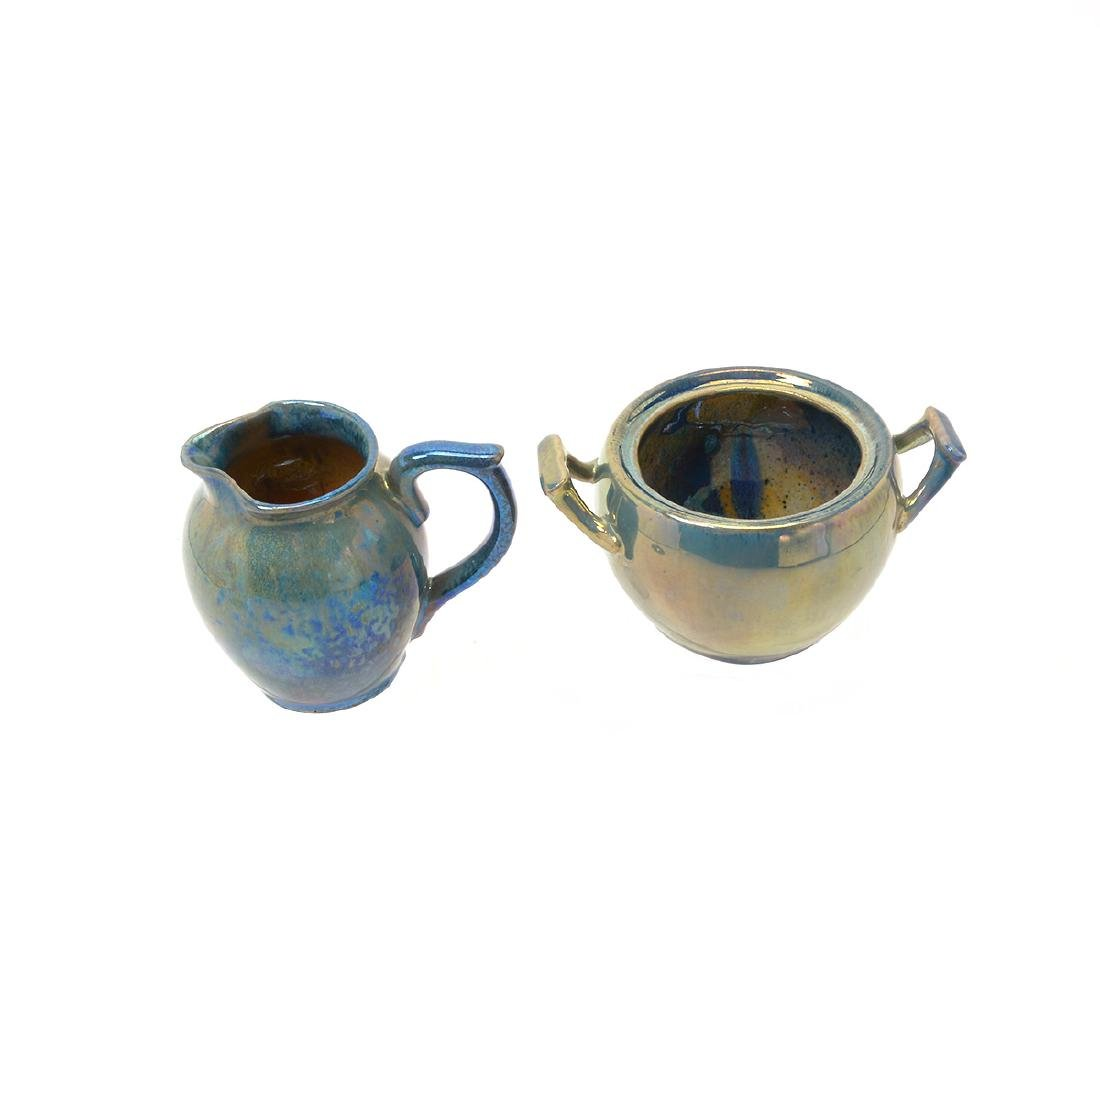 Alphonse Cytere Iridescent Art Pottery Tea Service - 9